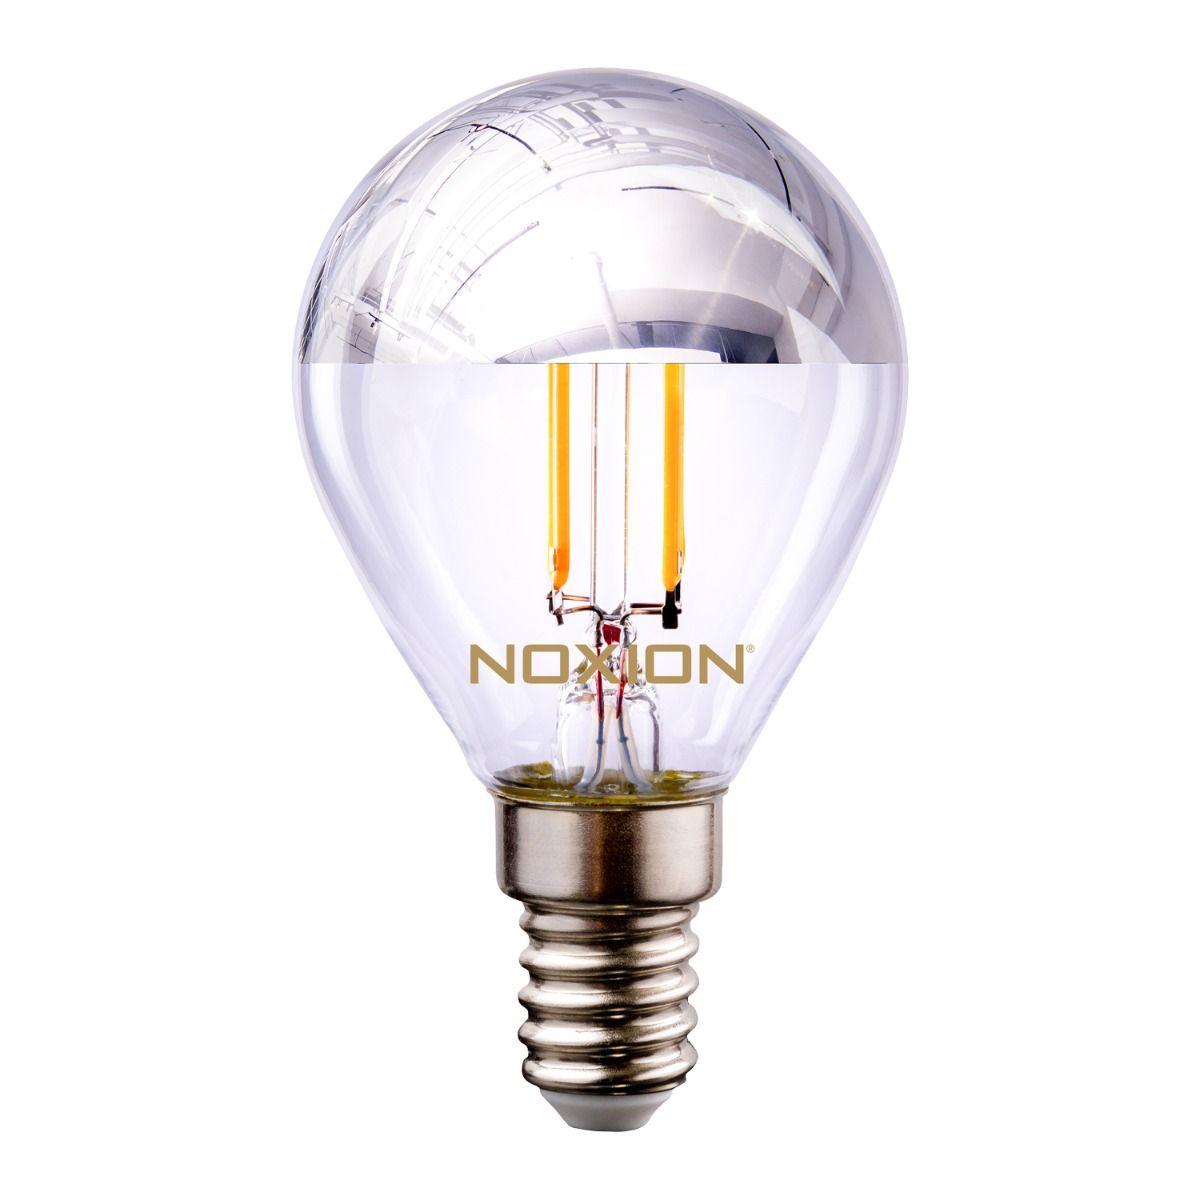 Noxion Lucent filament LED Lustre sølv mirror P45 E14 220-240V 4.5W 400LM CRI80 2700K ND (40W eqv)